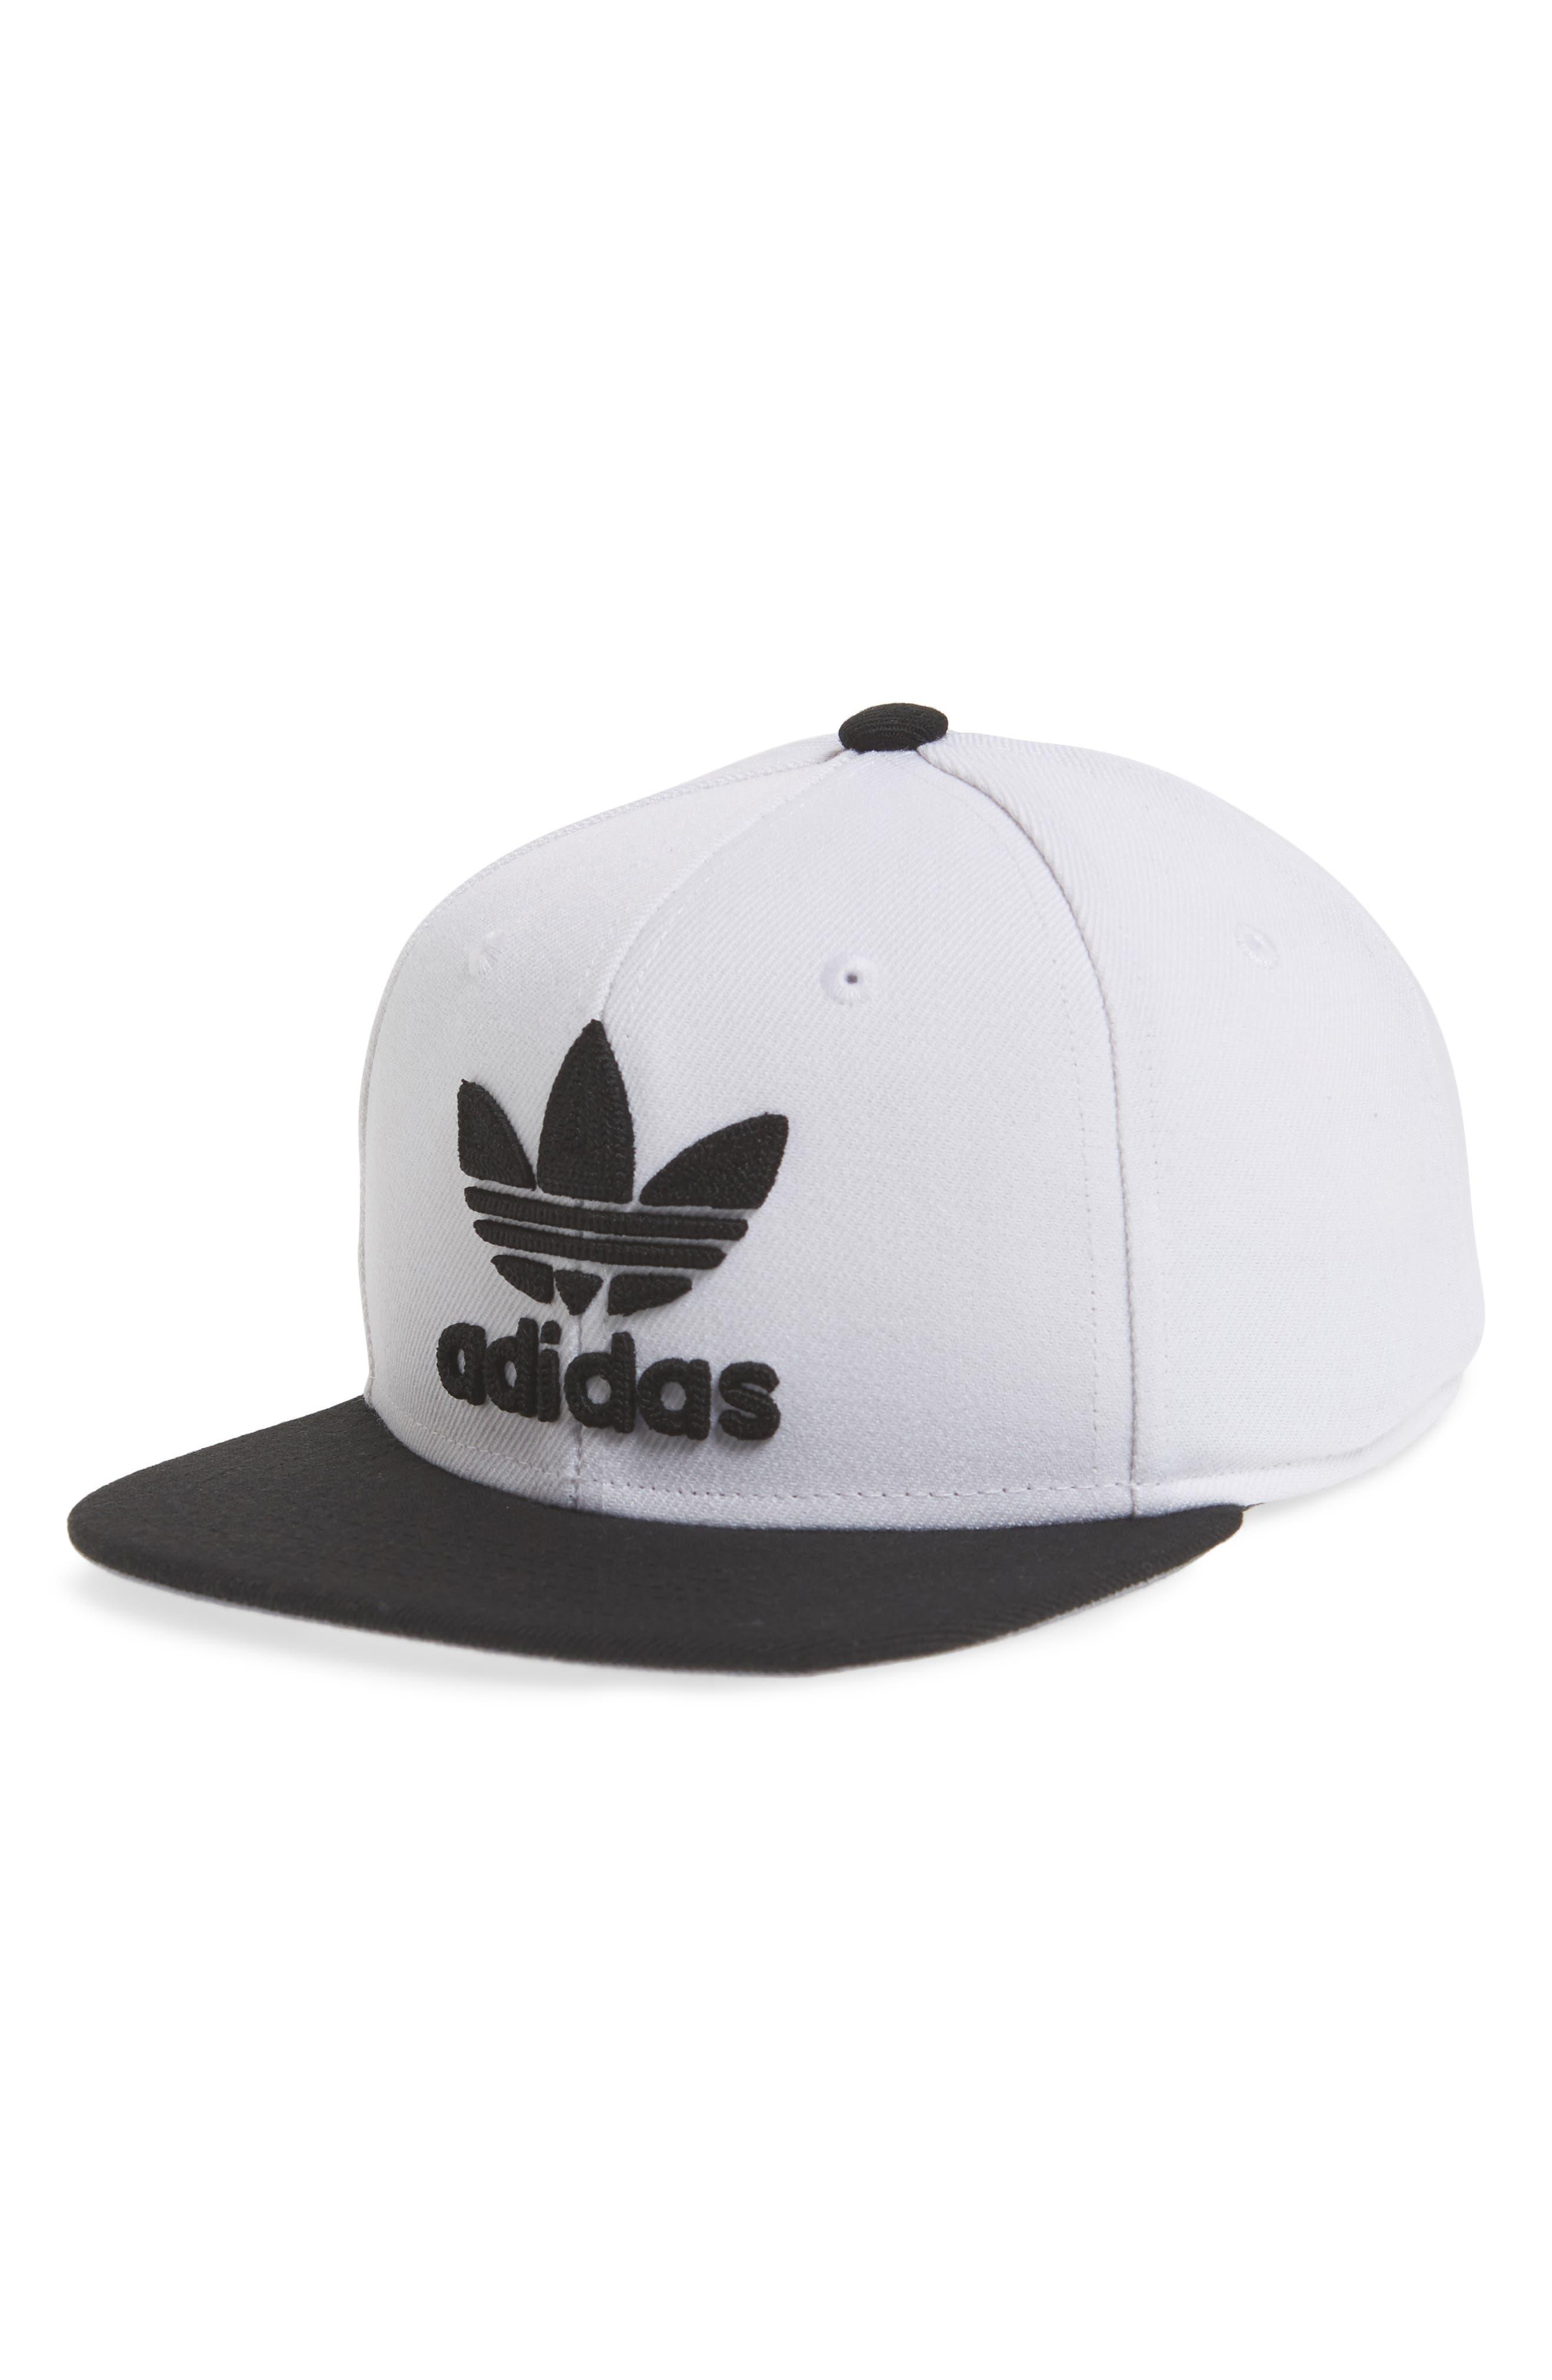 adidas Originals Snapback Hat (Boys)